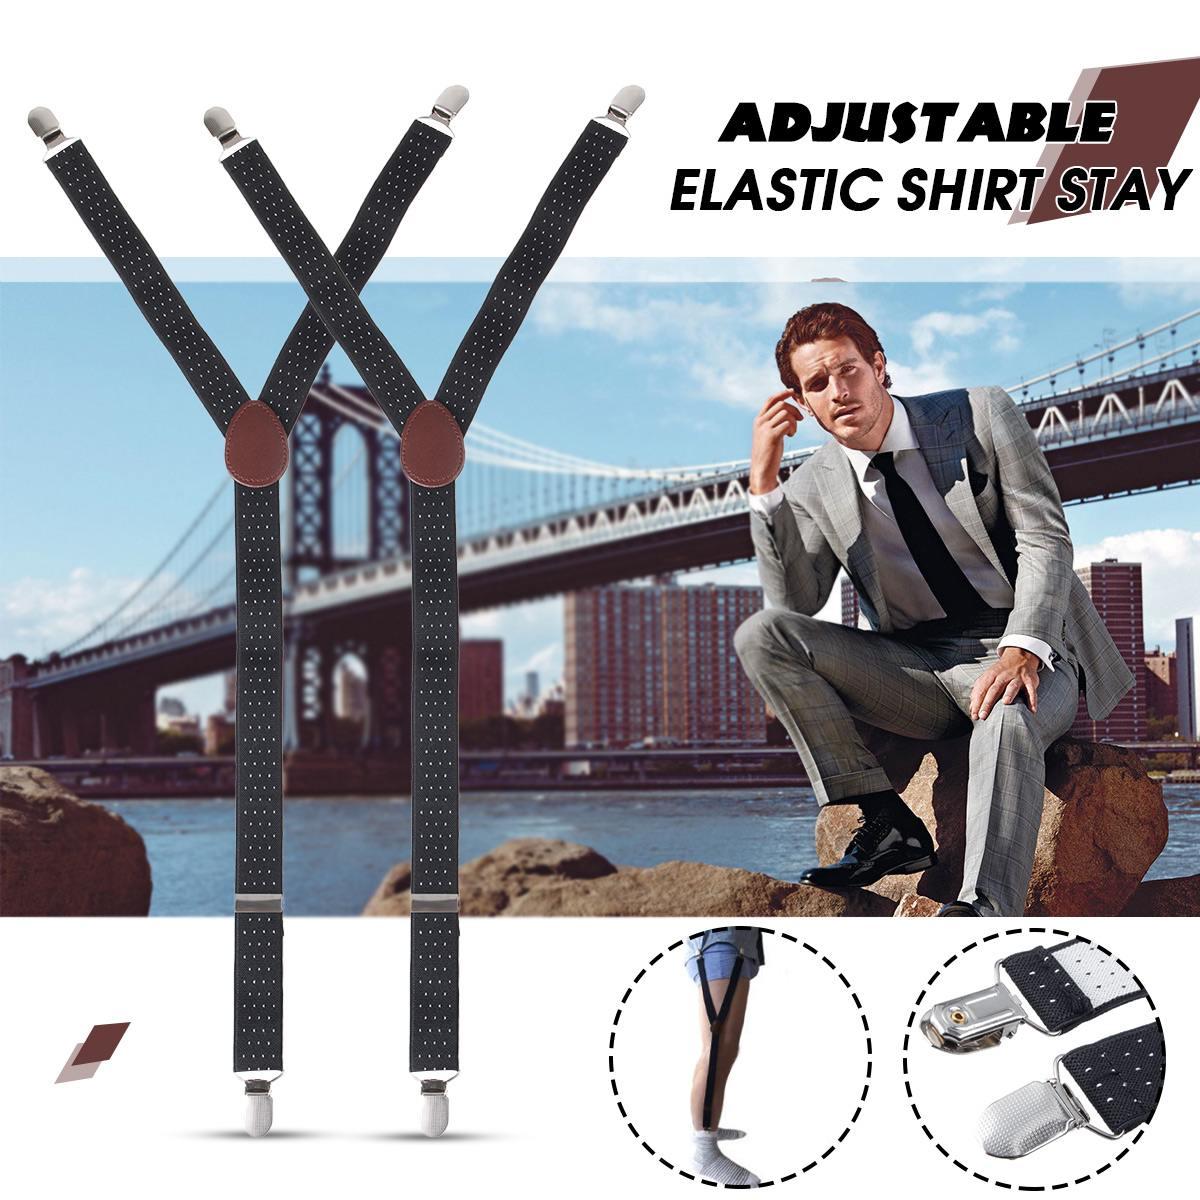 Pair Y-Style Shirt Stays Adjustable Elastic Garters Strap Non-slip Clamps Y-Shape Suspenders For Men Women